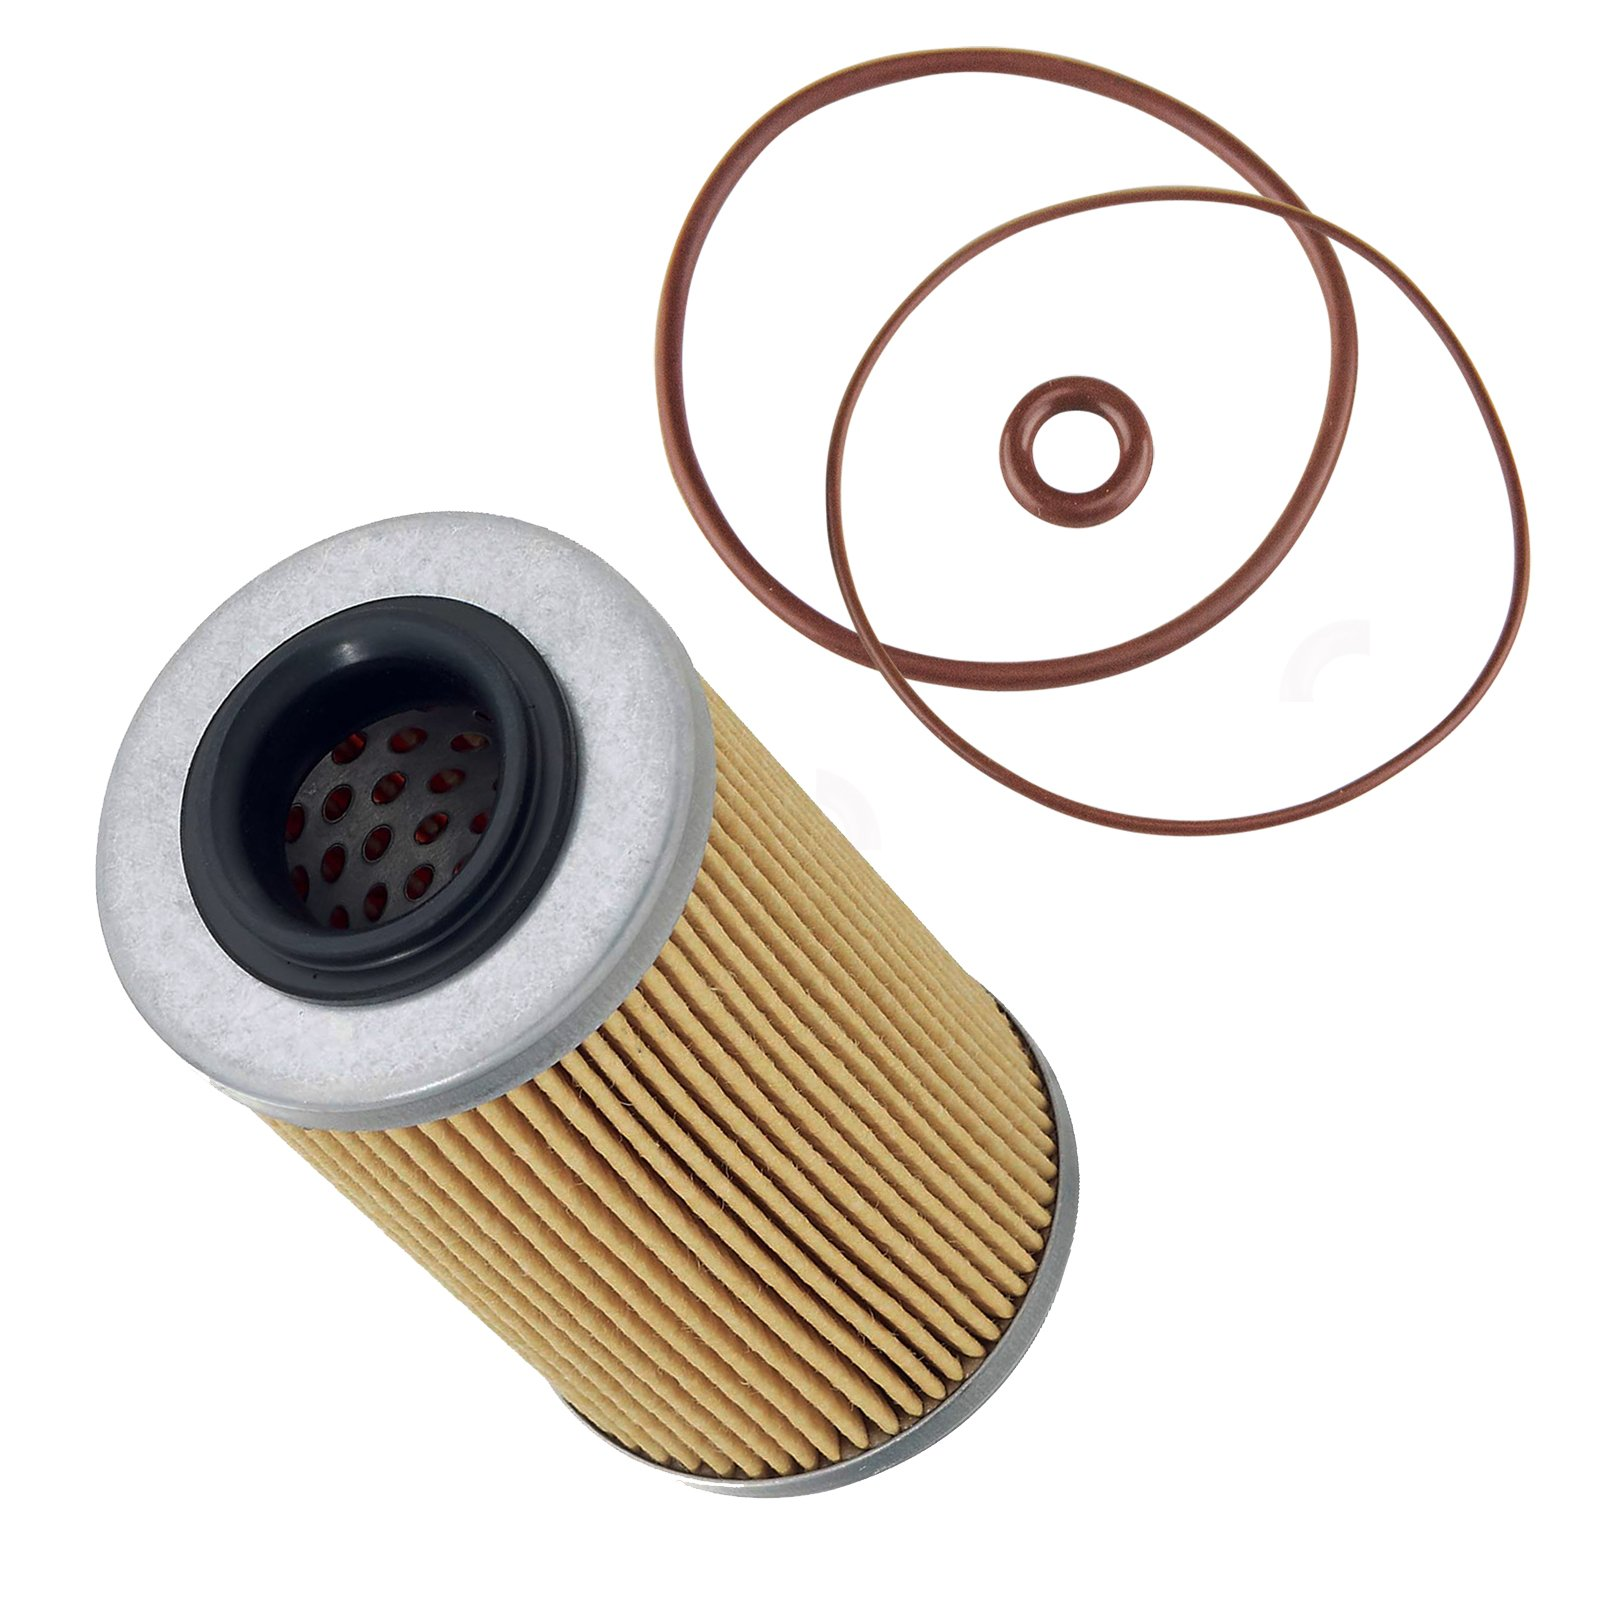 Sea-Doo 4-Tec Oil Filter & O-Ring Kit 2002-2012 RXP / RXT / GTI /GTS / SE GTR GTX / iS / SC